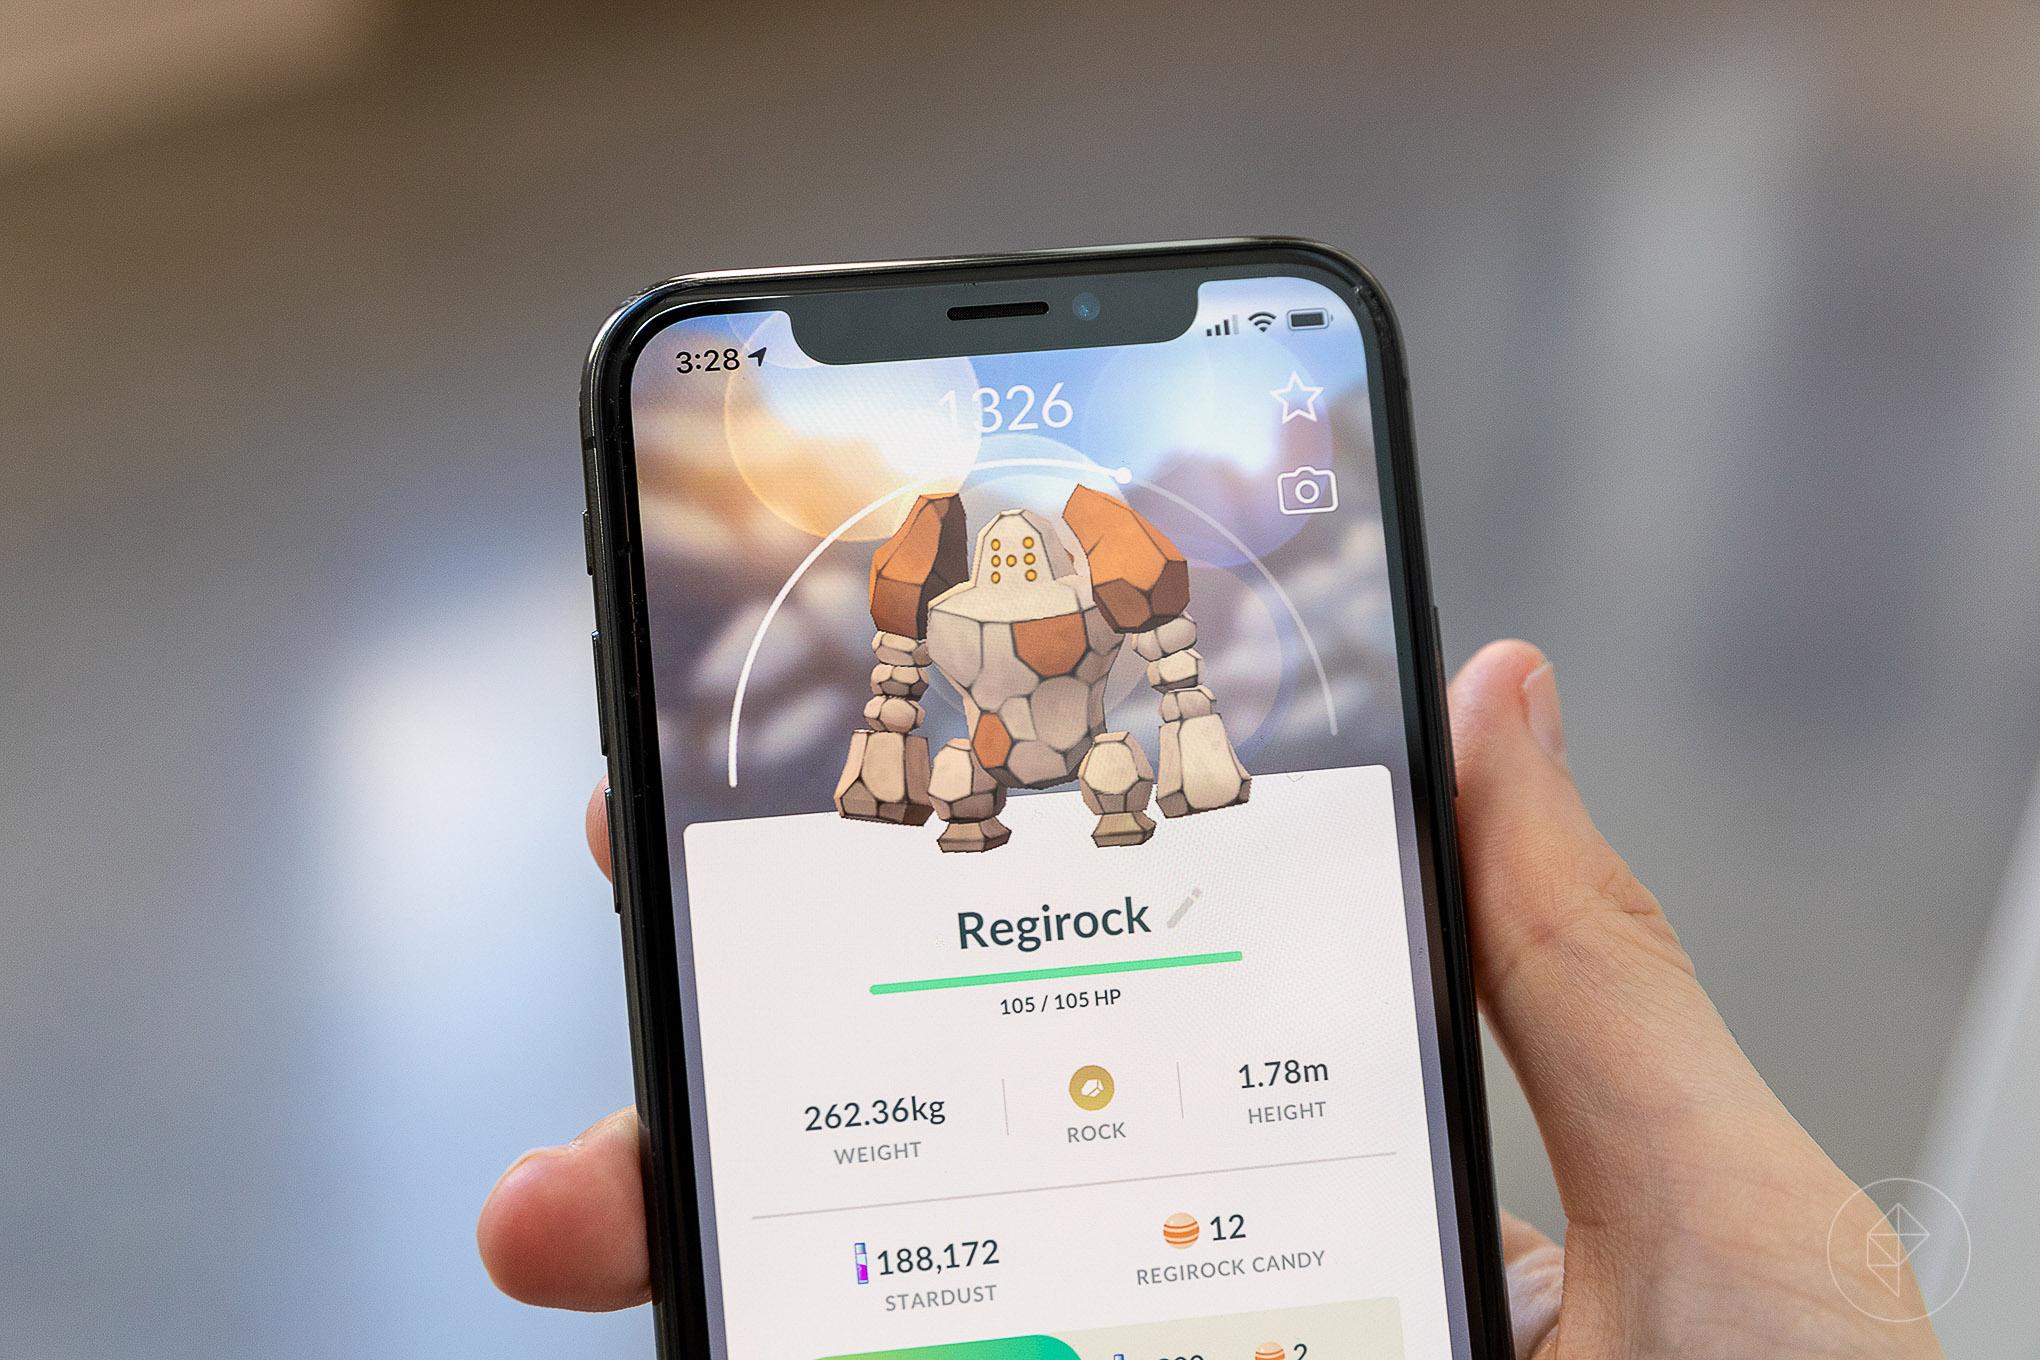 Pokémon Go Regirock raid guide: counters and best movesets